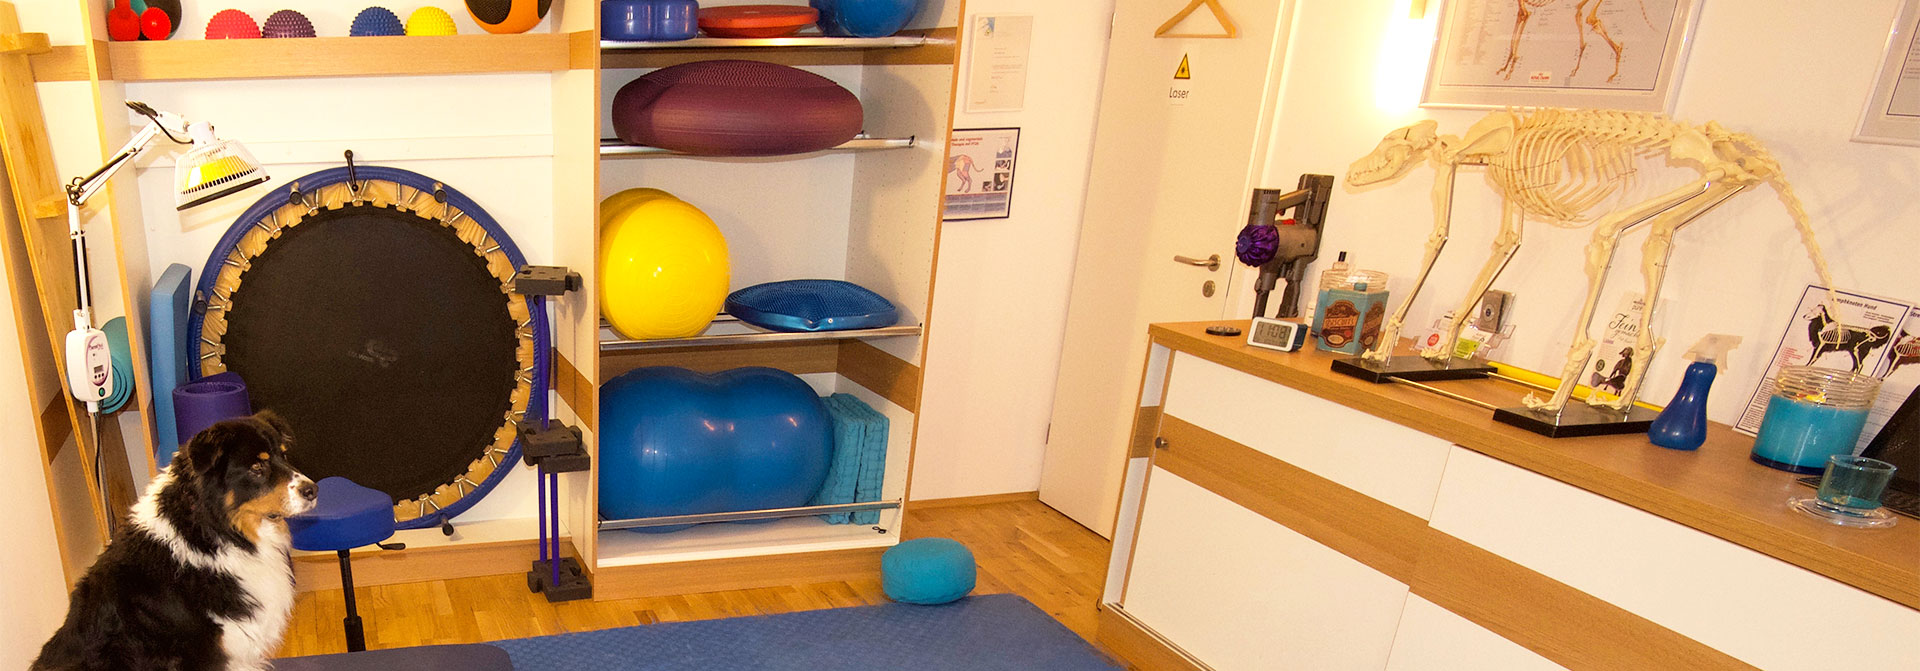 Praxis Physiotherapie Hunde